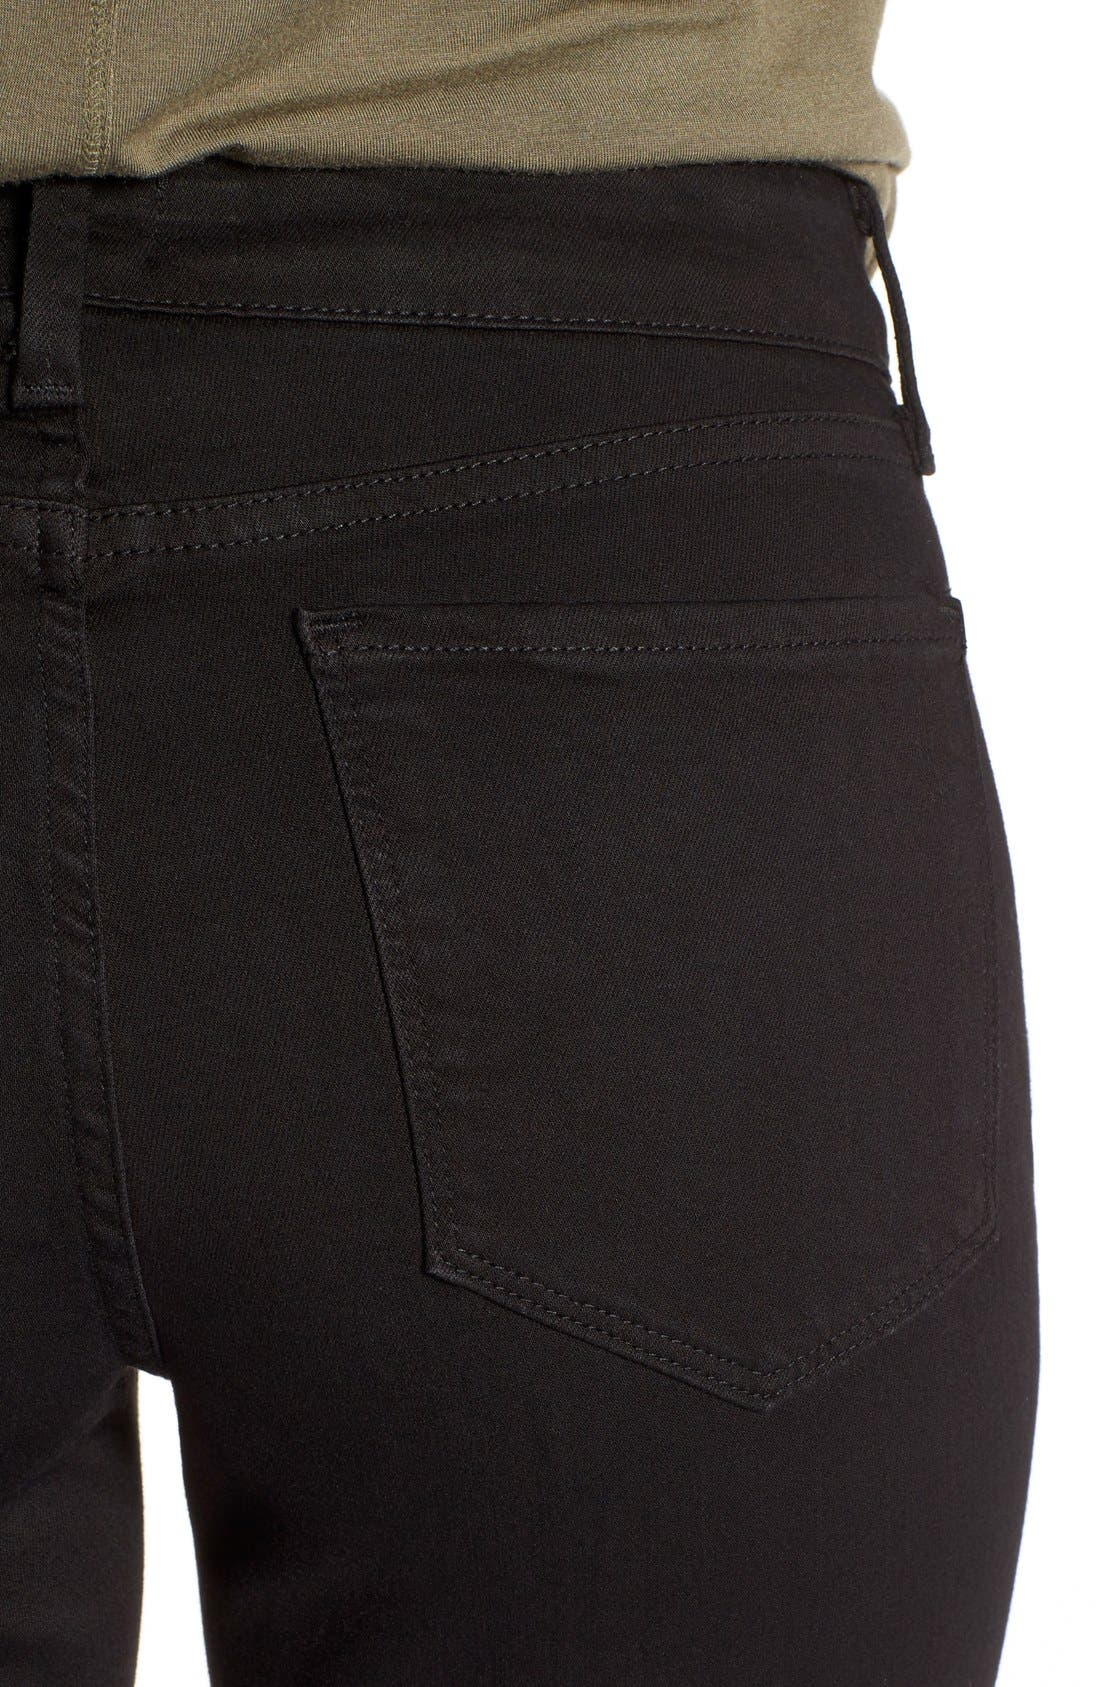 'Clarissa' Stretch Ankle Skinny Jeans,                             Alternate thumbnail 4, color,                             Black Garment Wash